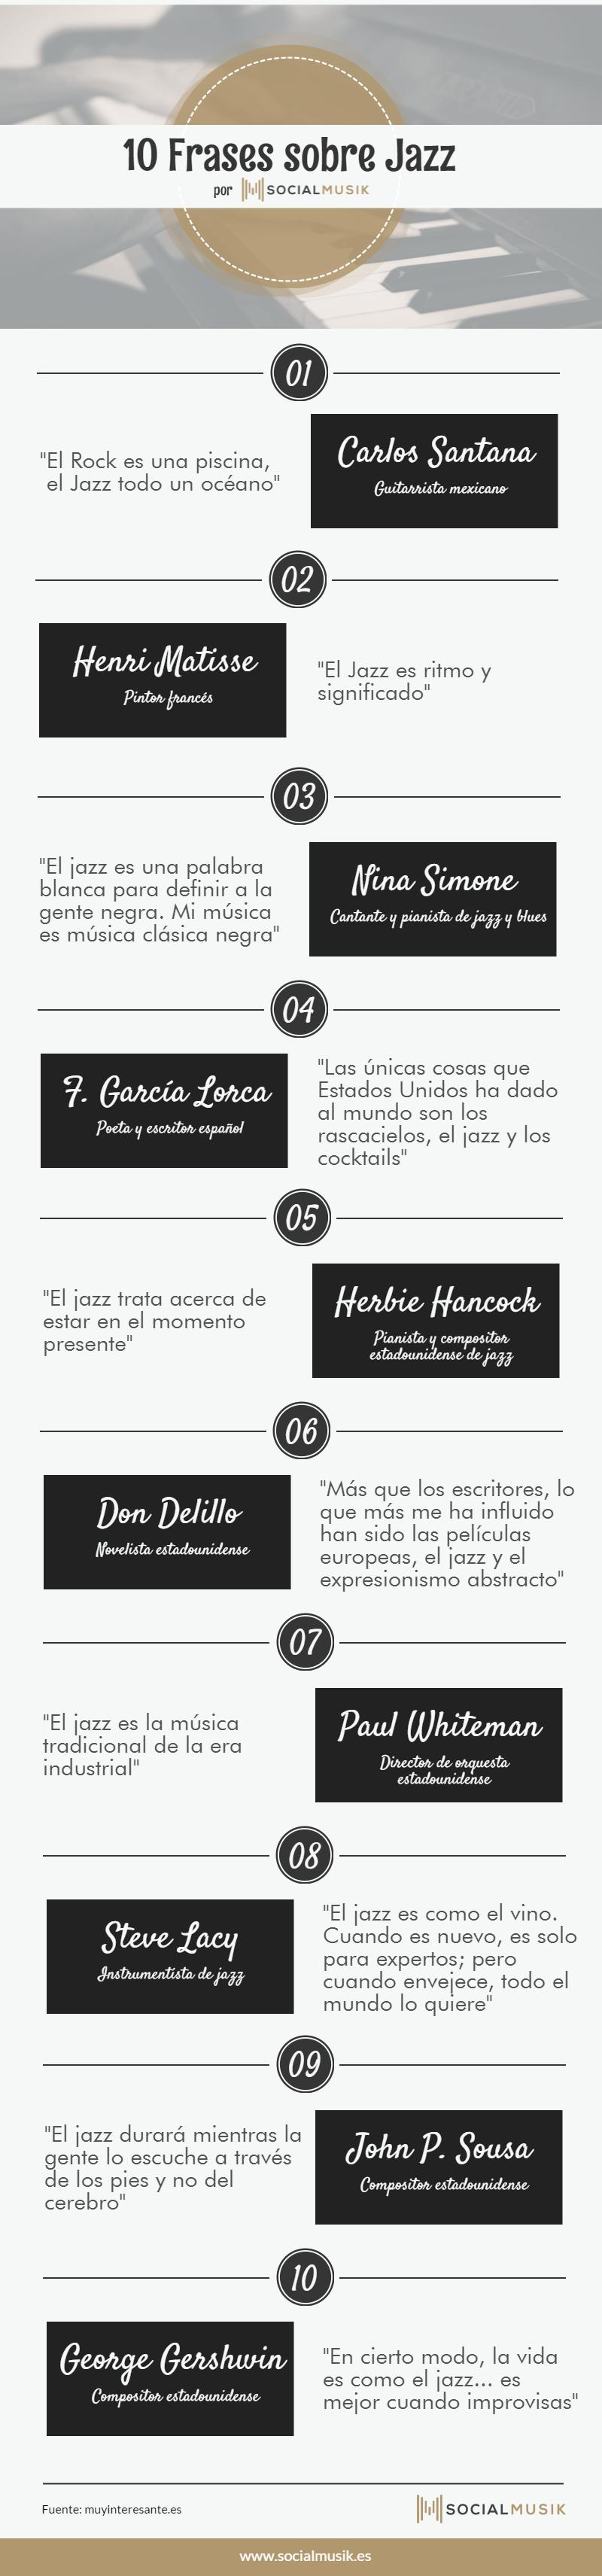 Infografía - 10 frases sobre jazz